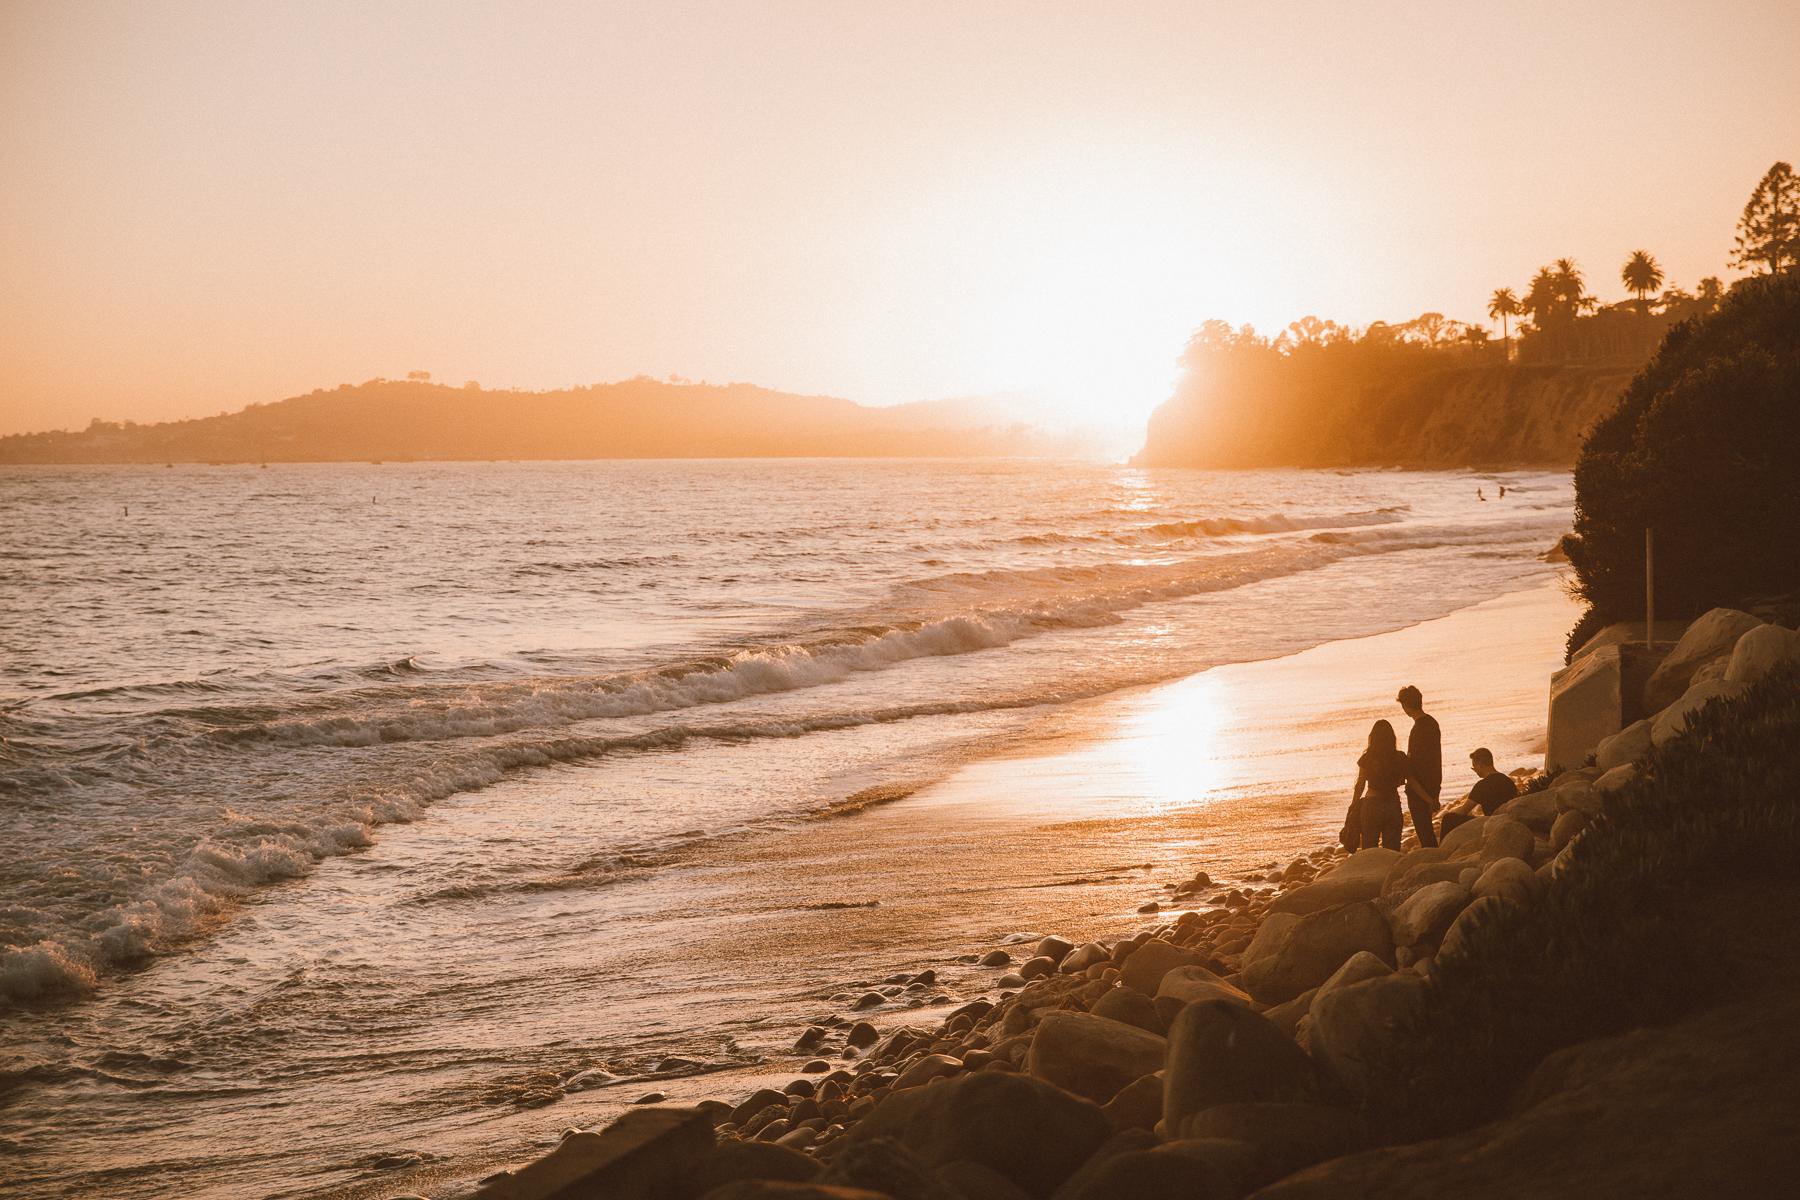 California Road trip by photographer Ailera Stone